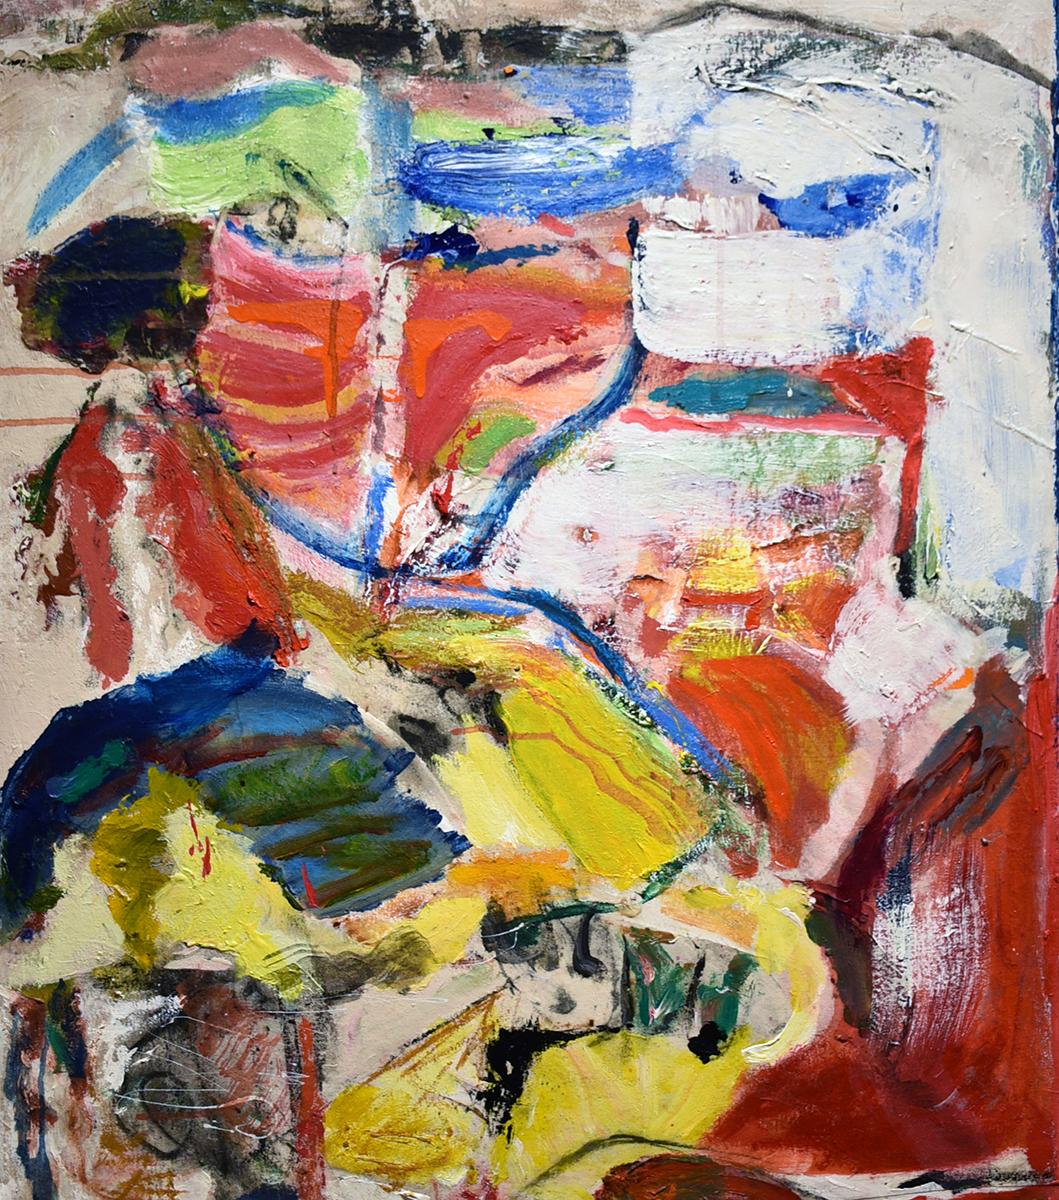 John Beardman, Skedaddle, 2017, Mixed Media on Canvas, 32 x 28 inches, low res.jpg